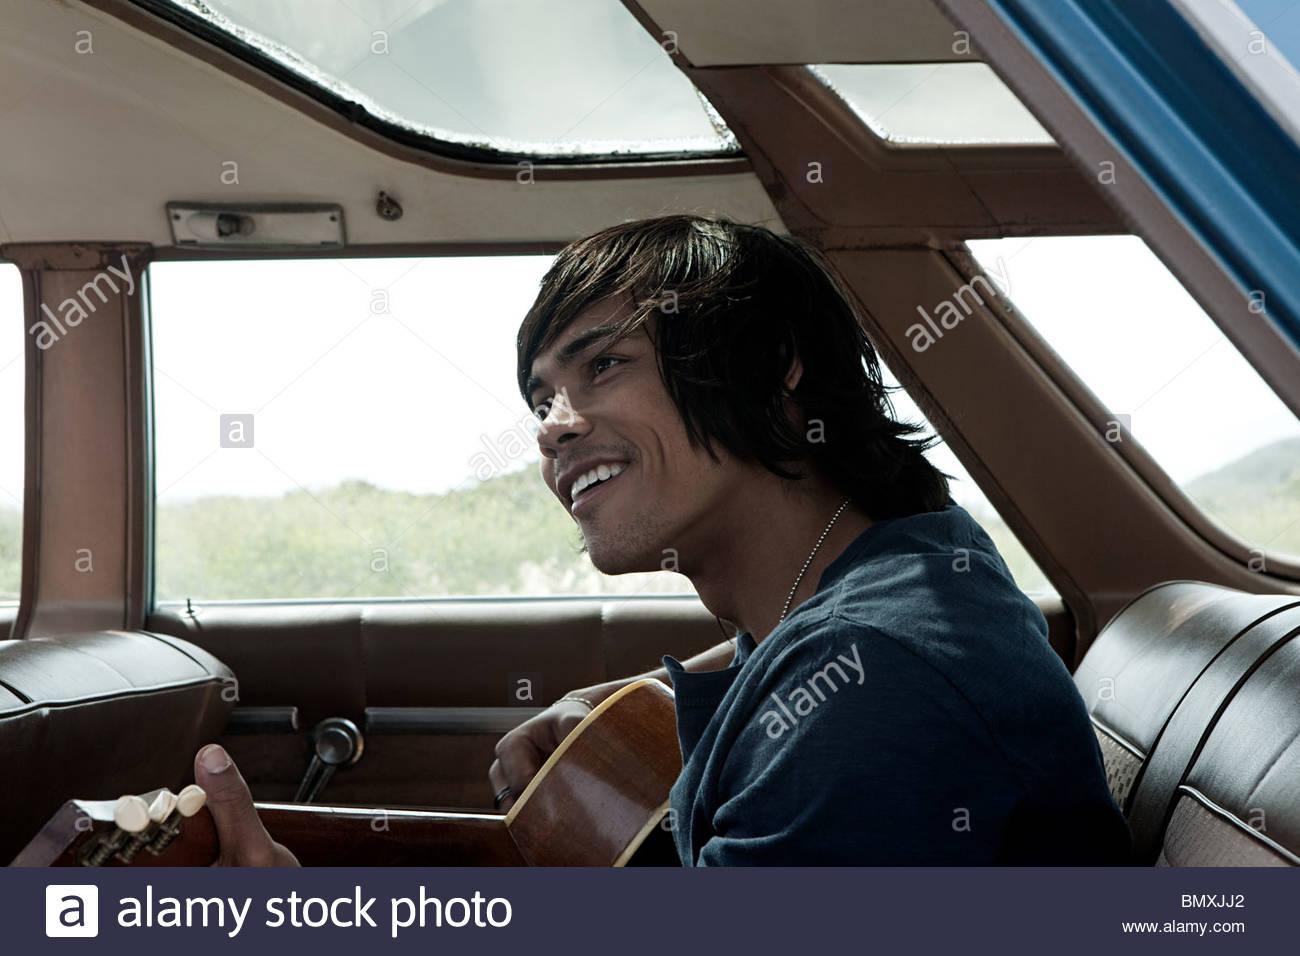 Young man inside car playing guitar - Stock Image